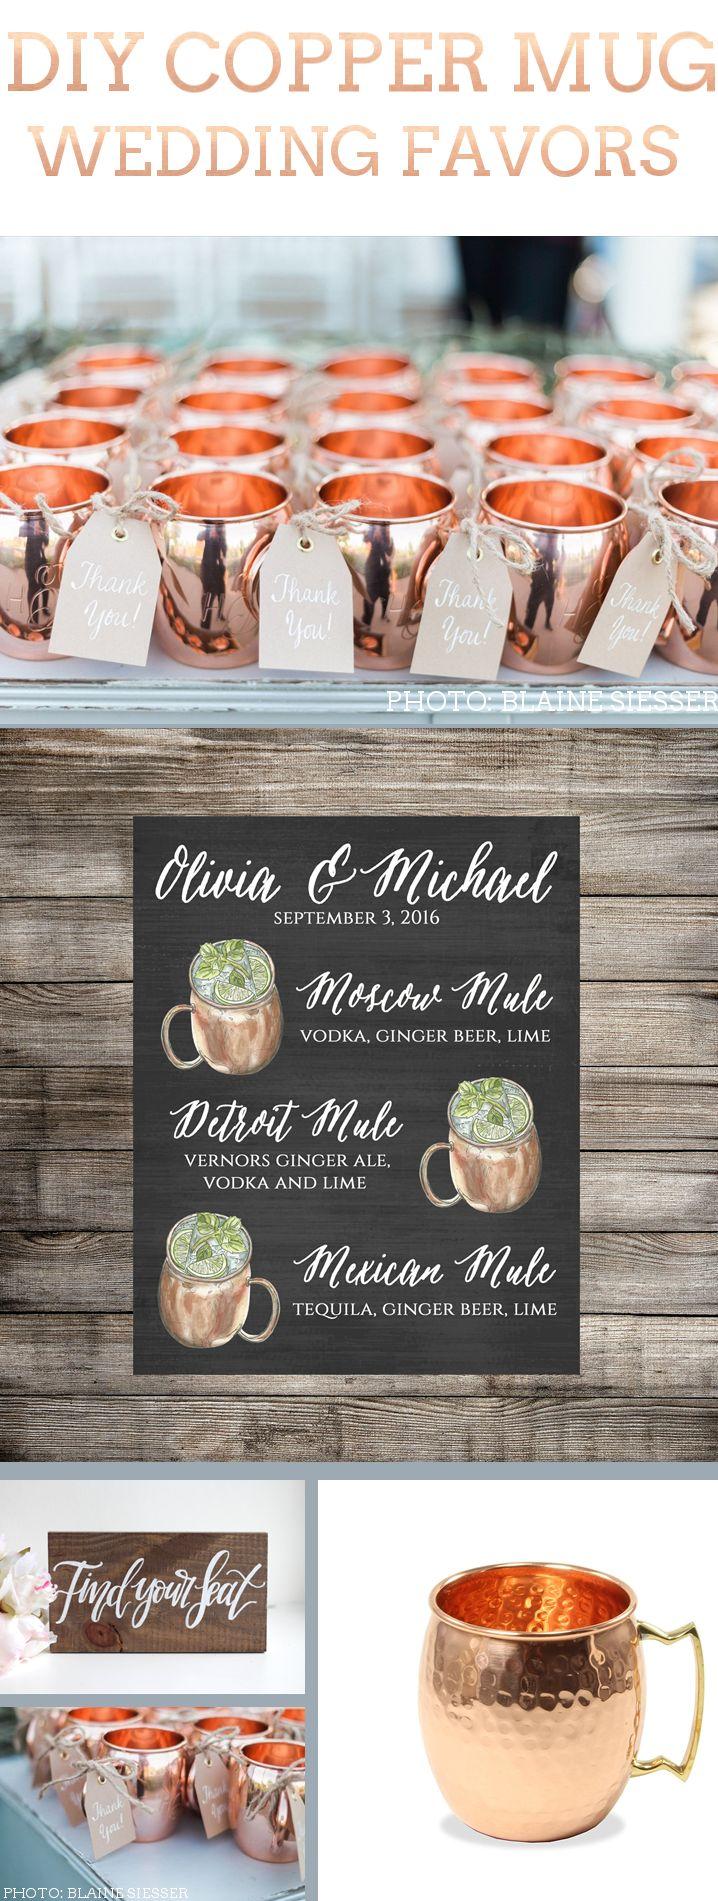 DIY Wedding Favors - DIY Copper Mug Favors - Do It Yourself Ideas ...